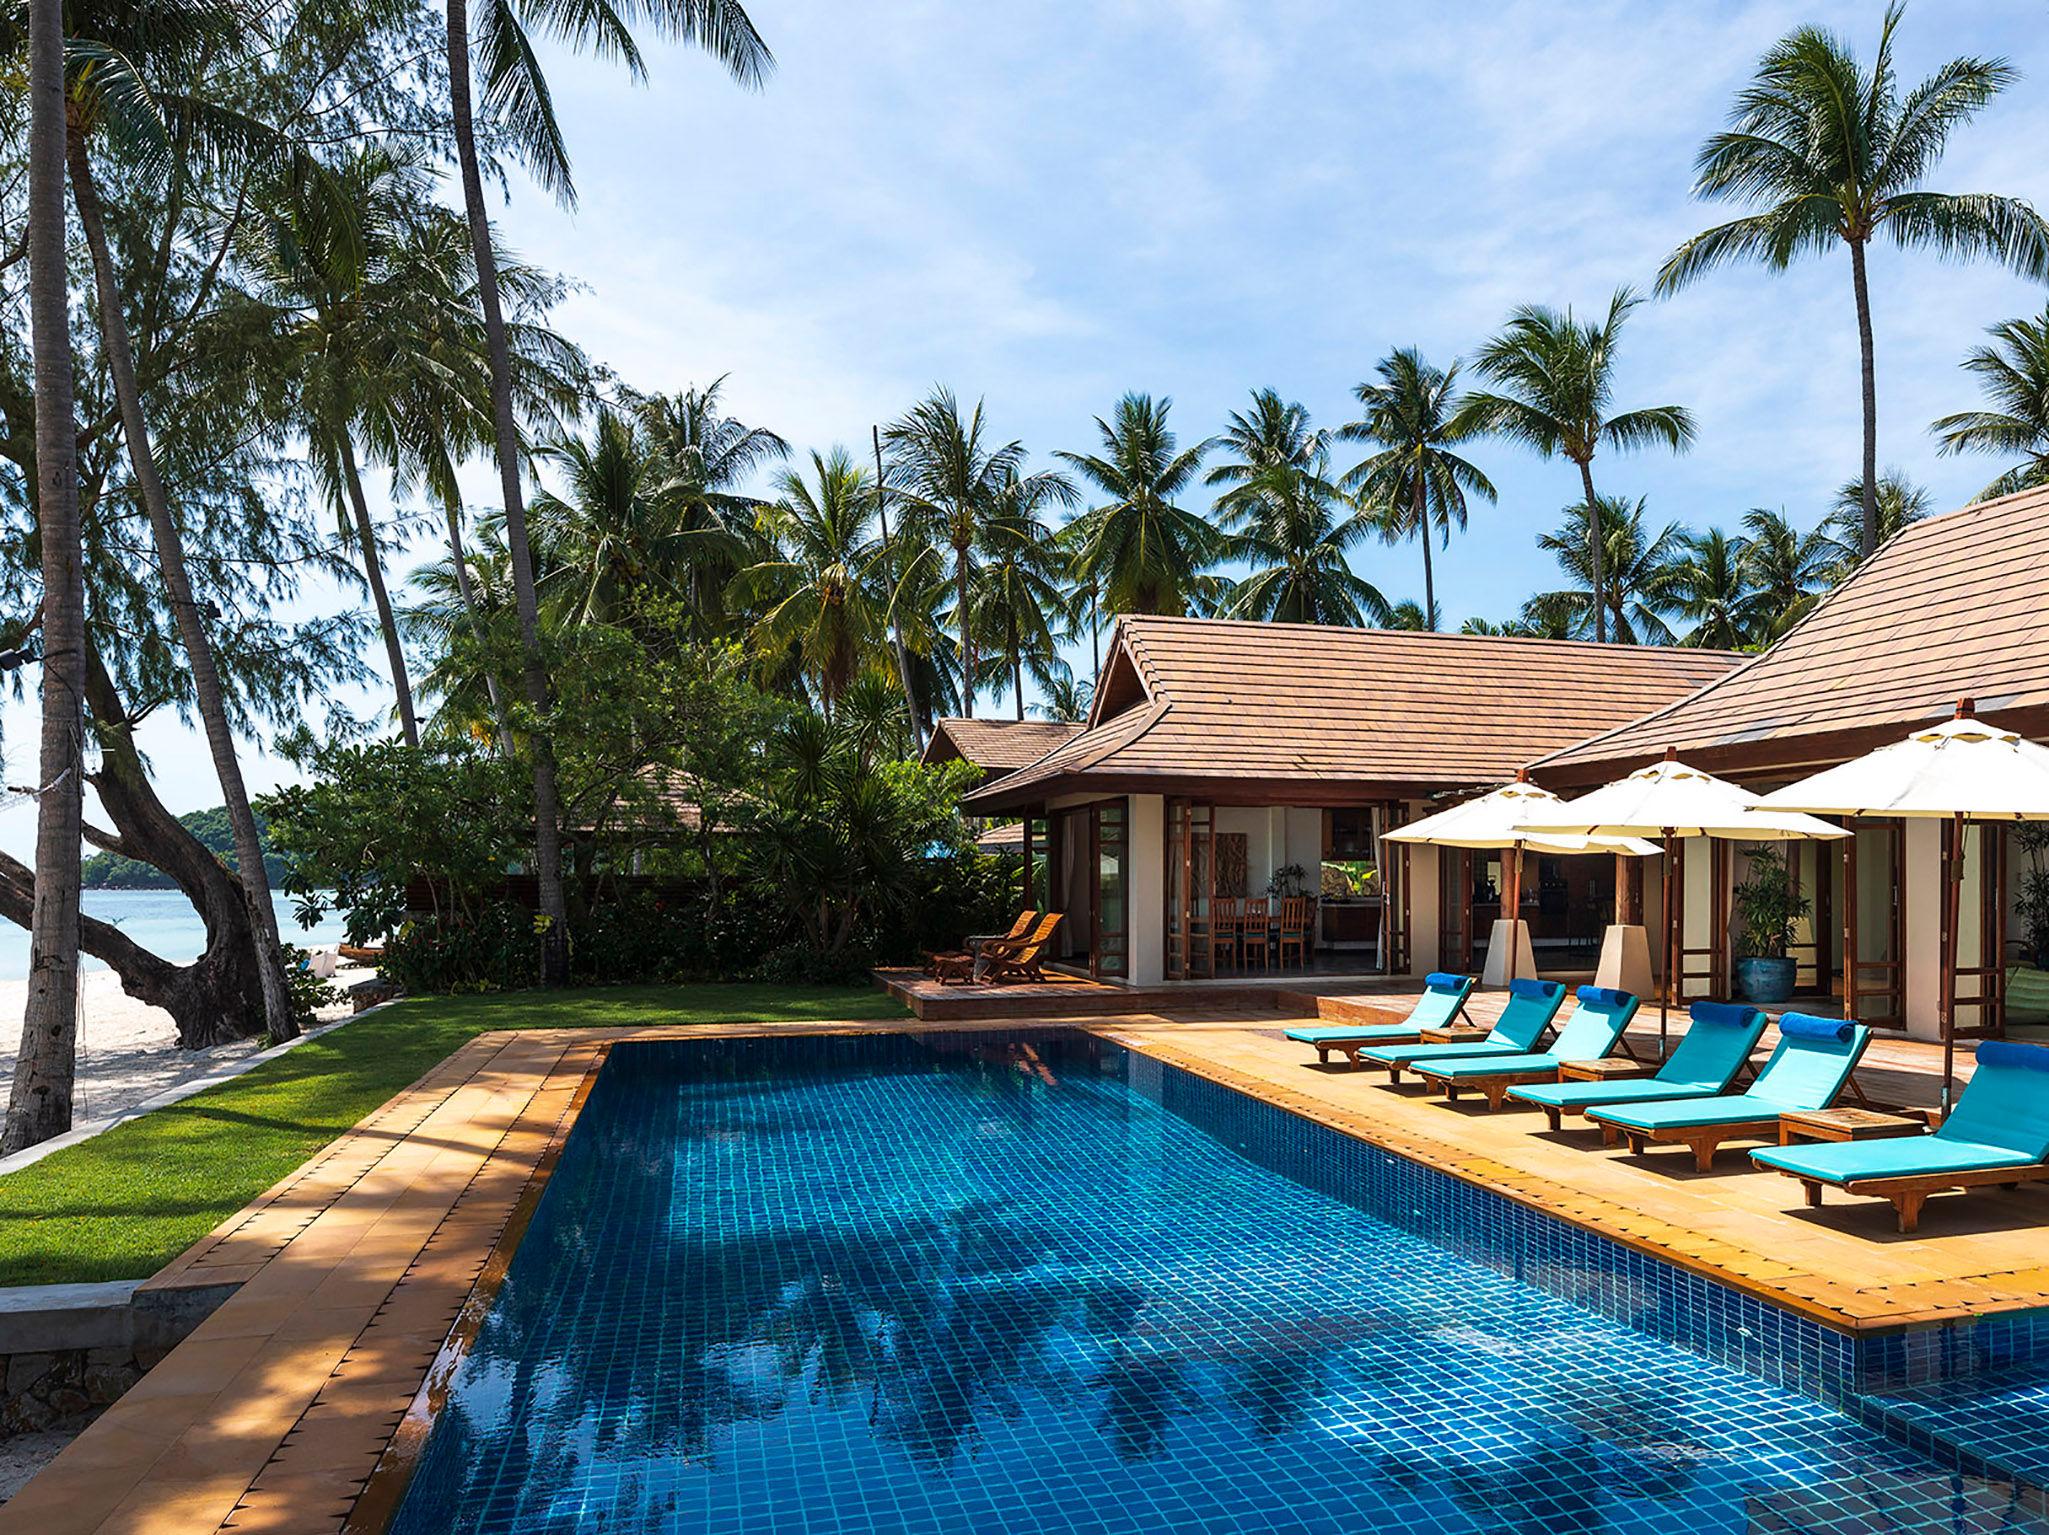 Waimarie - Pool and the villa